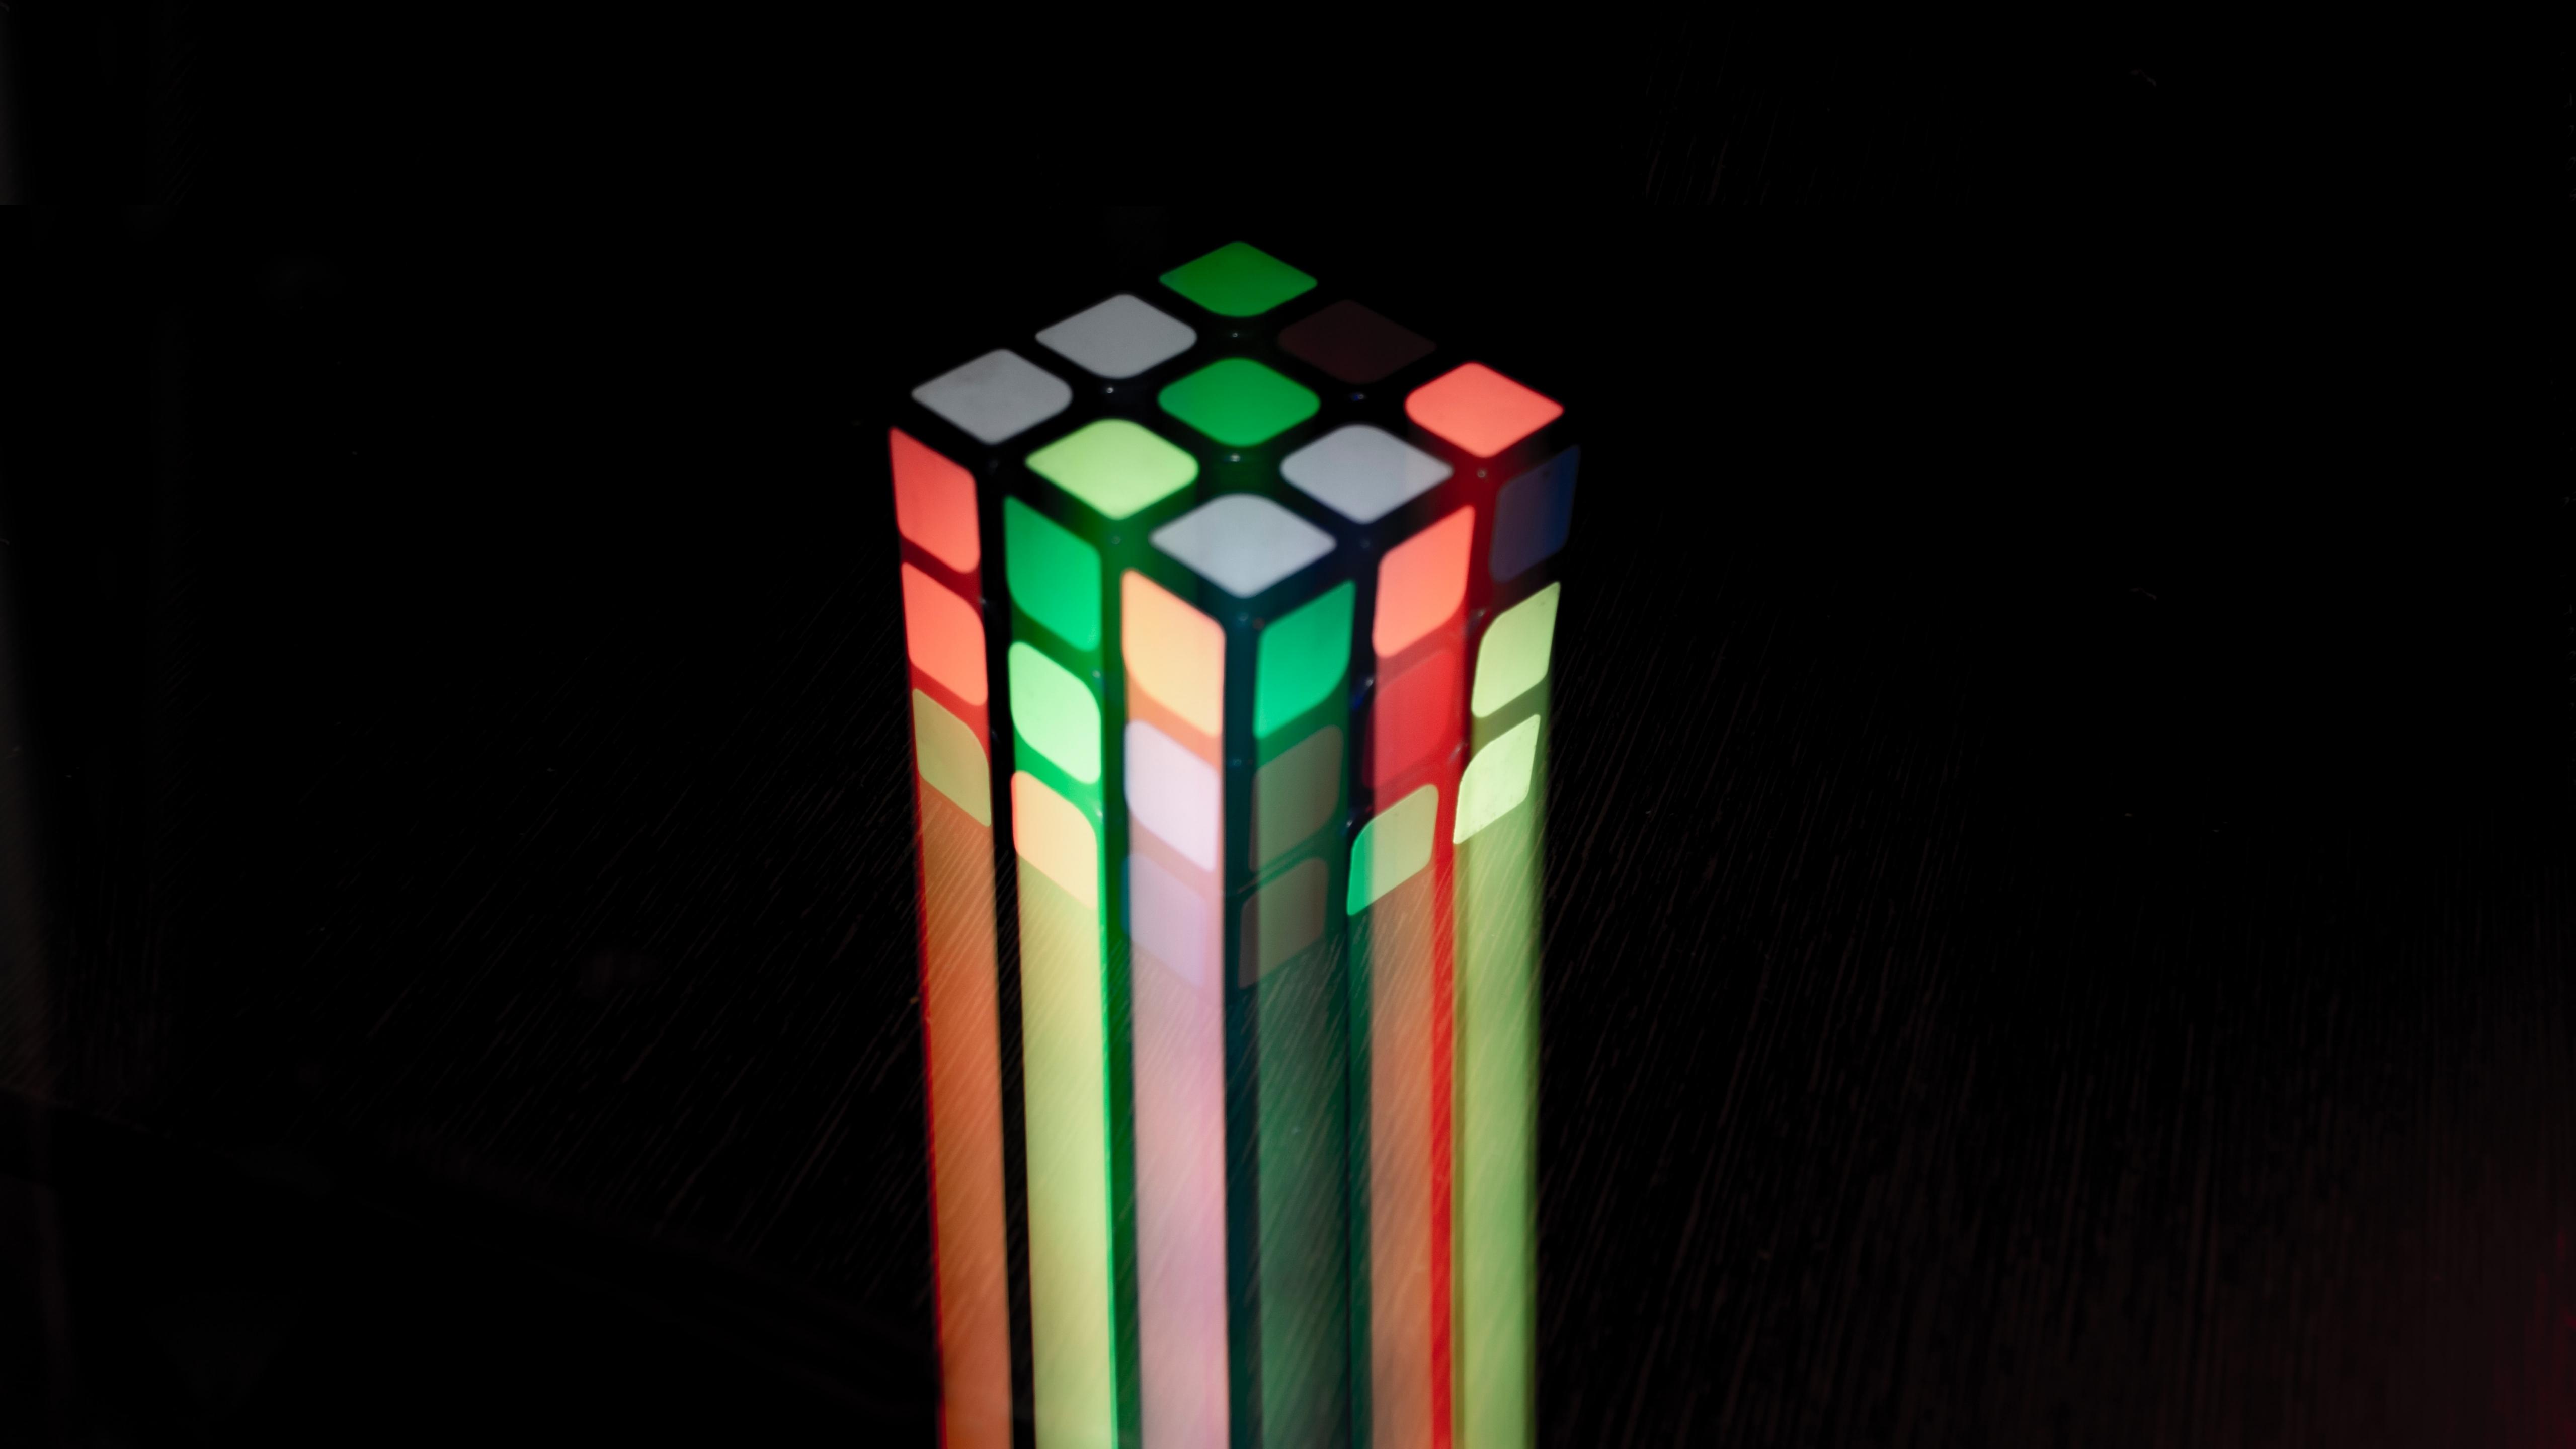 Download 5120x2880 Wallpaper Rubik S Cube Colorful Light